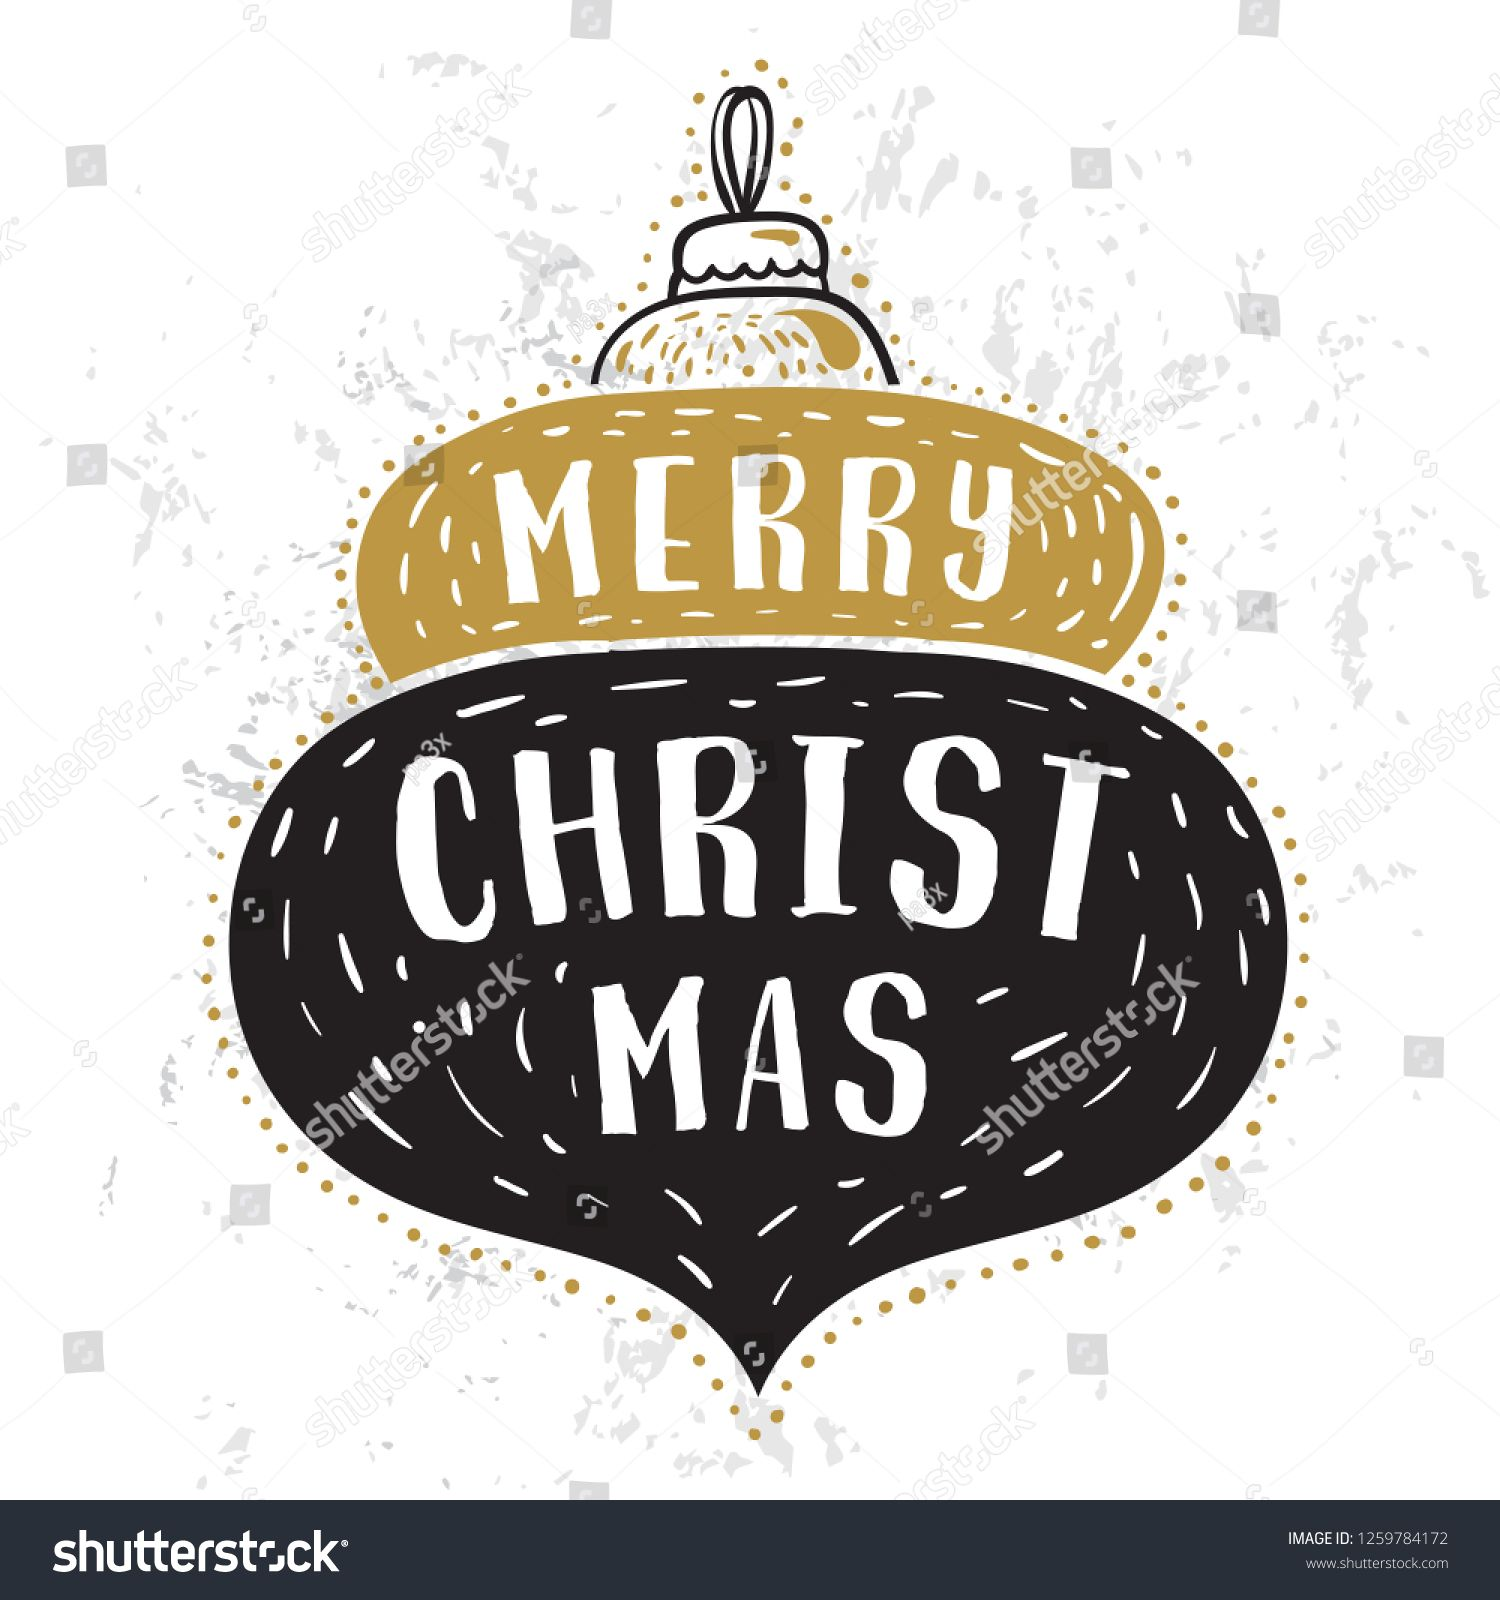 Merry Christmas. Typography. Vector logo, text design